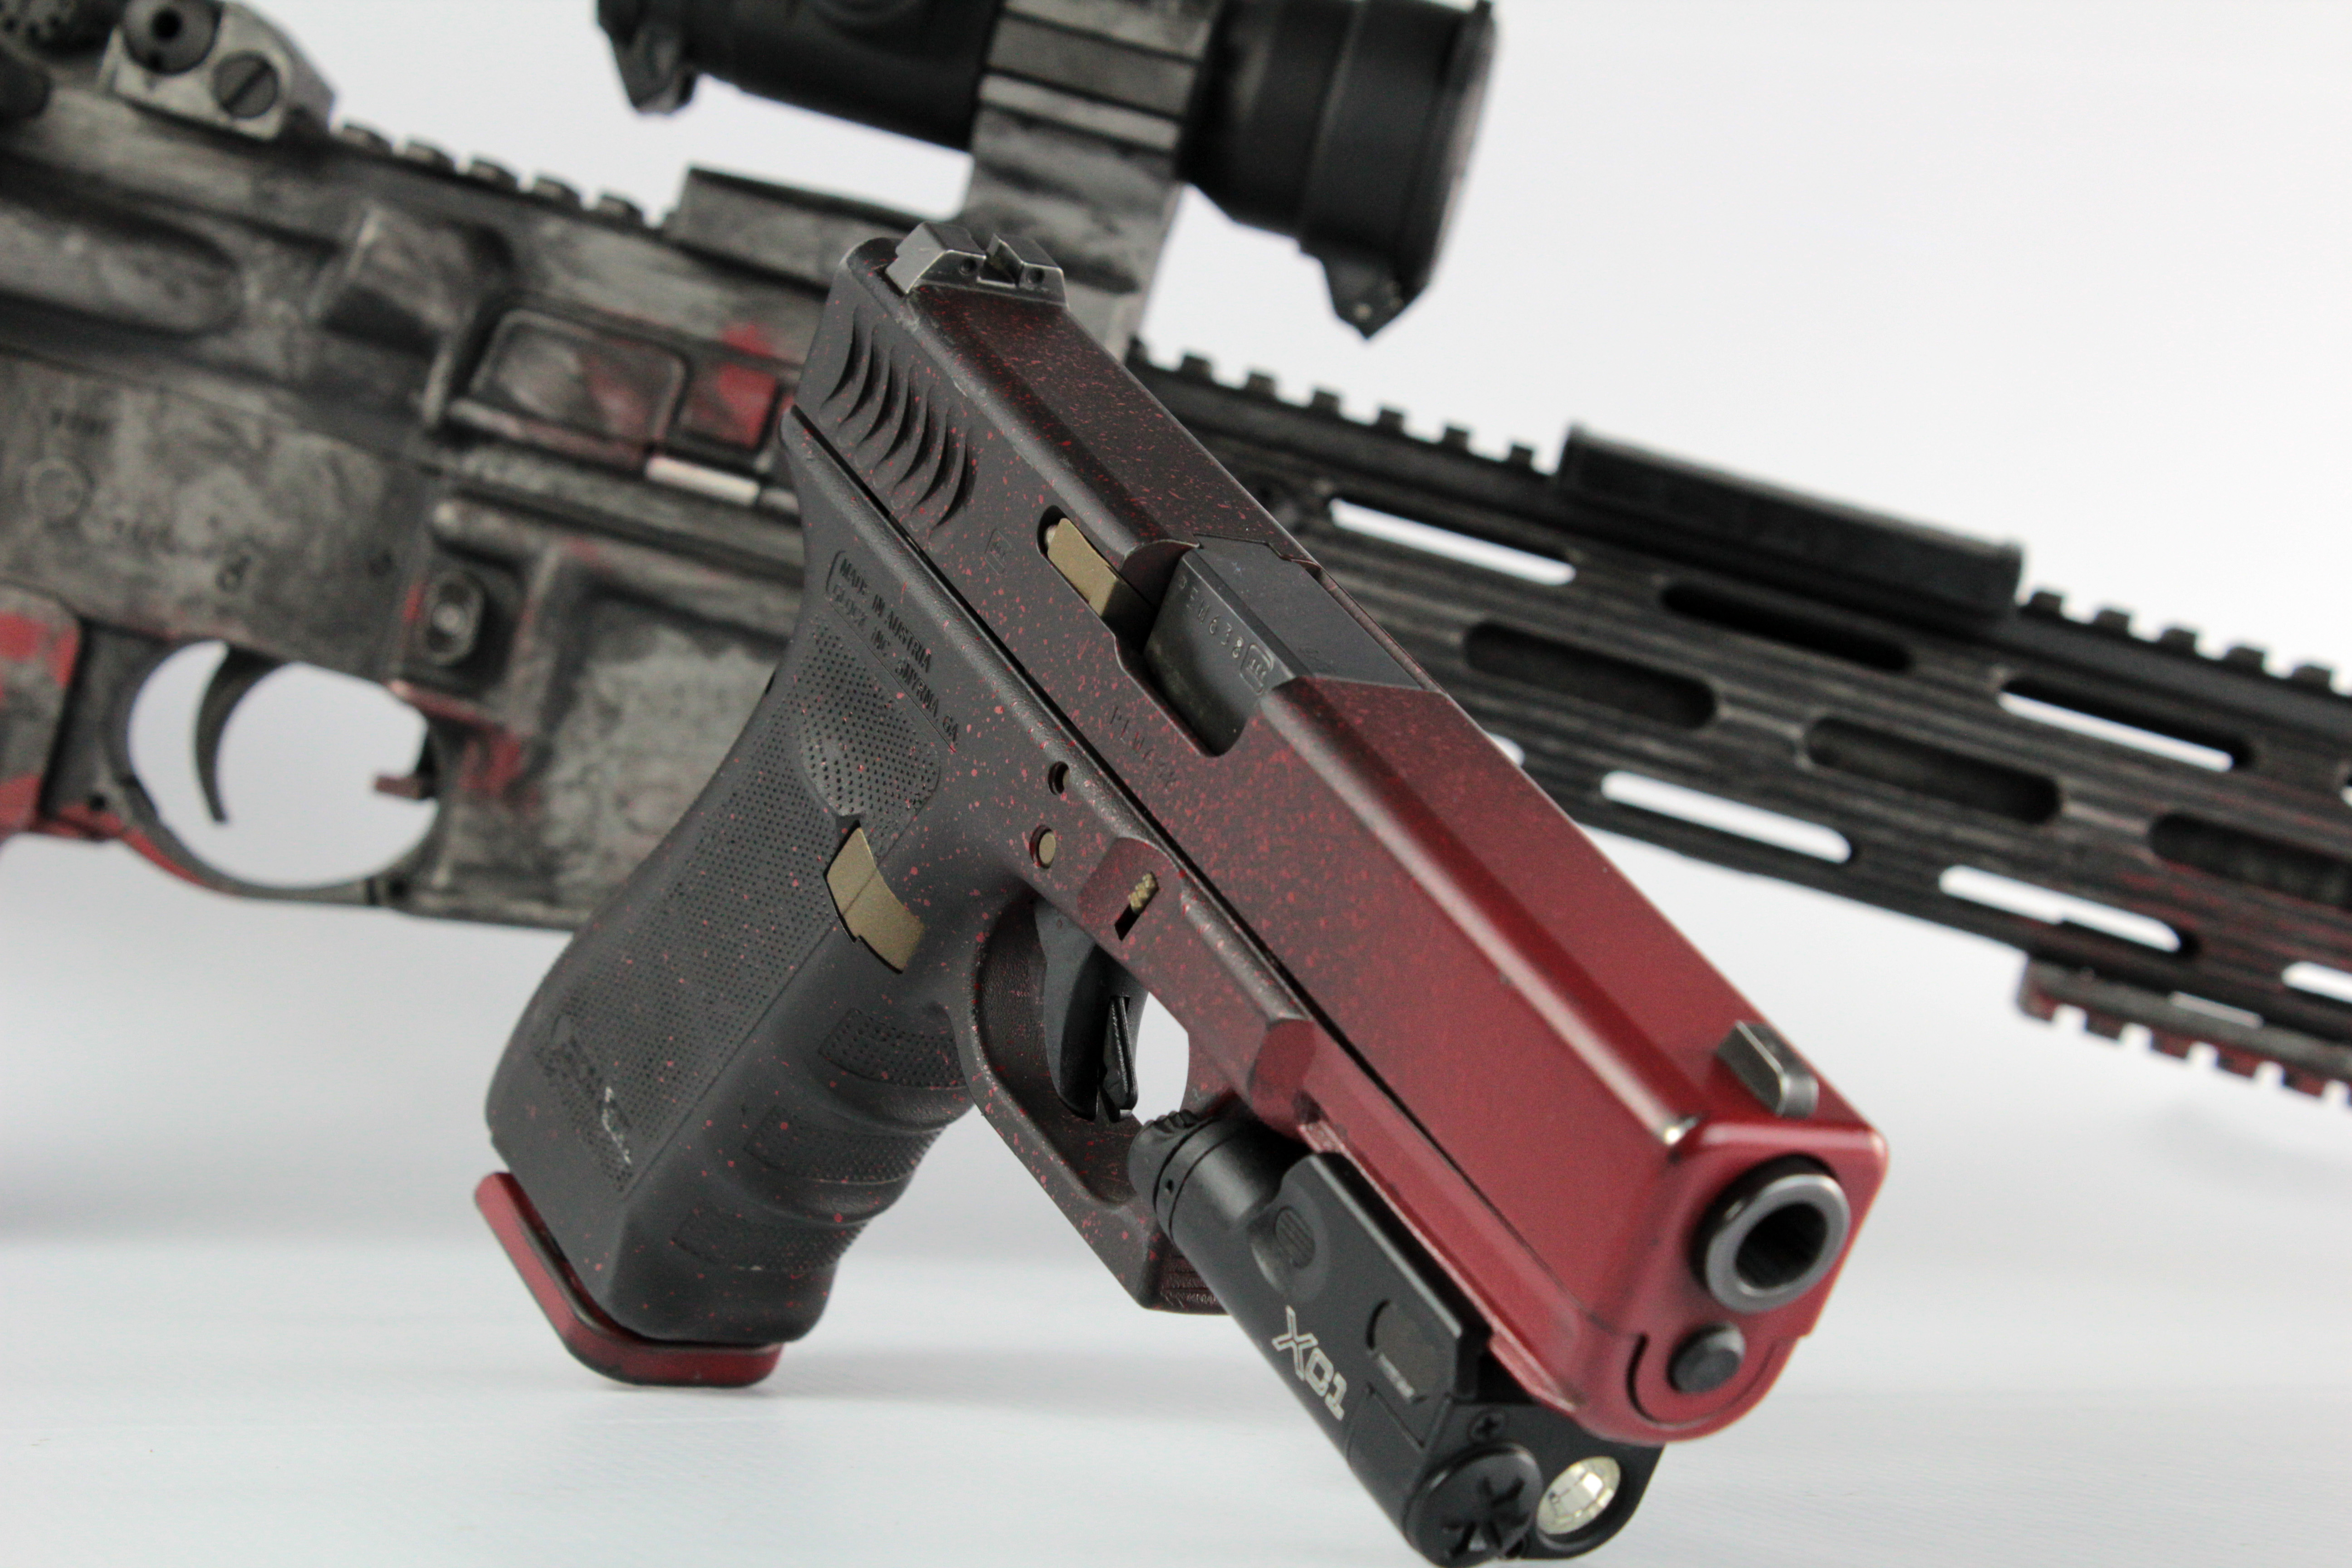 Distressed Cerakote Pistol